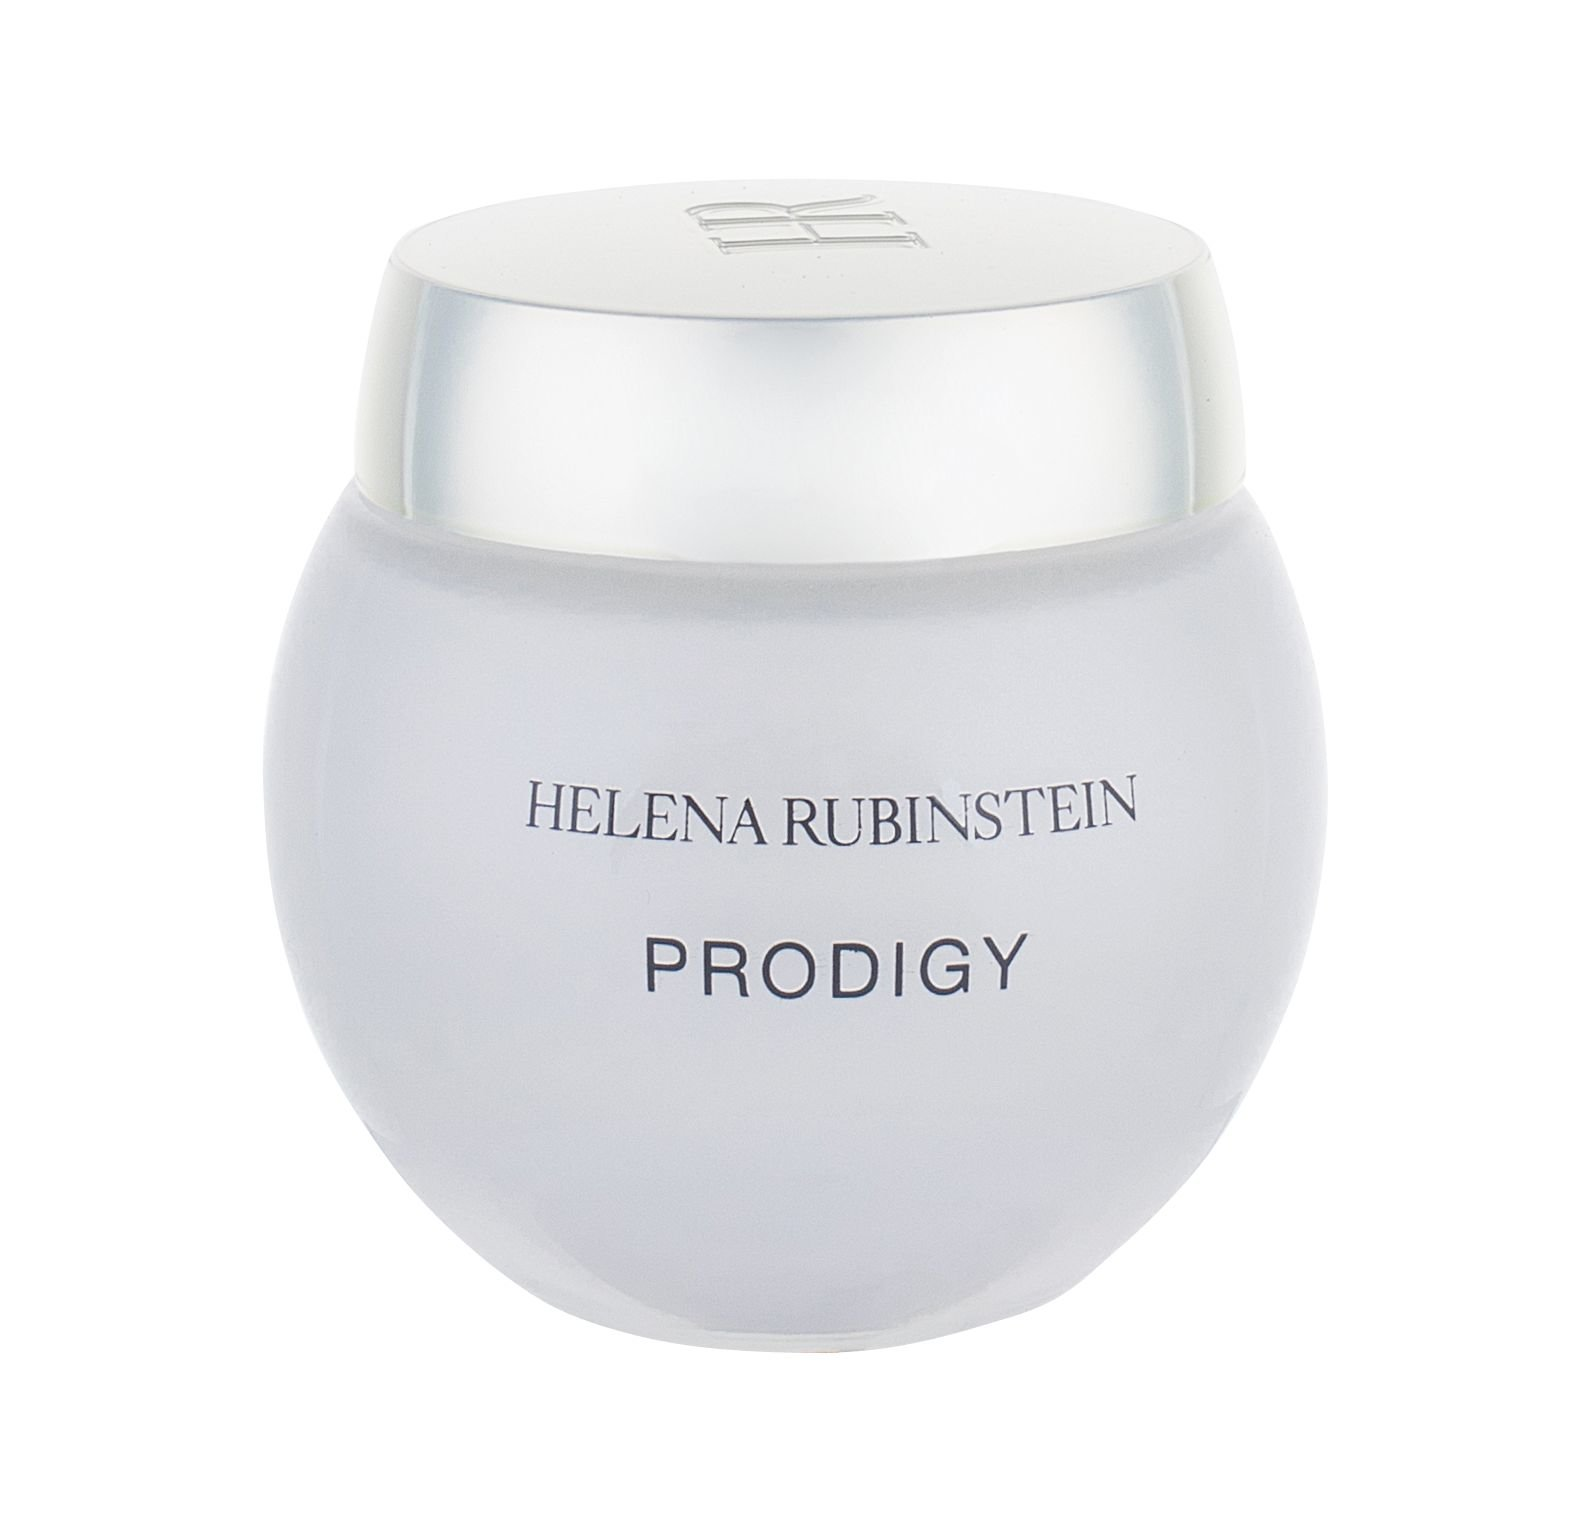 Helena Rubinstein Prodigy Cosmetic 50ml